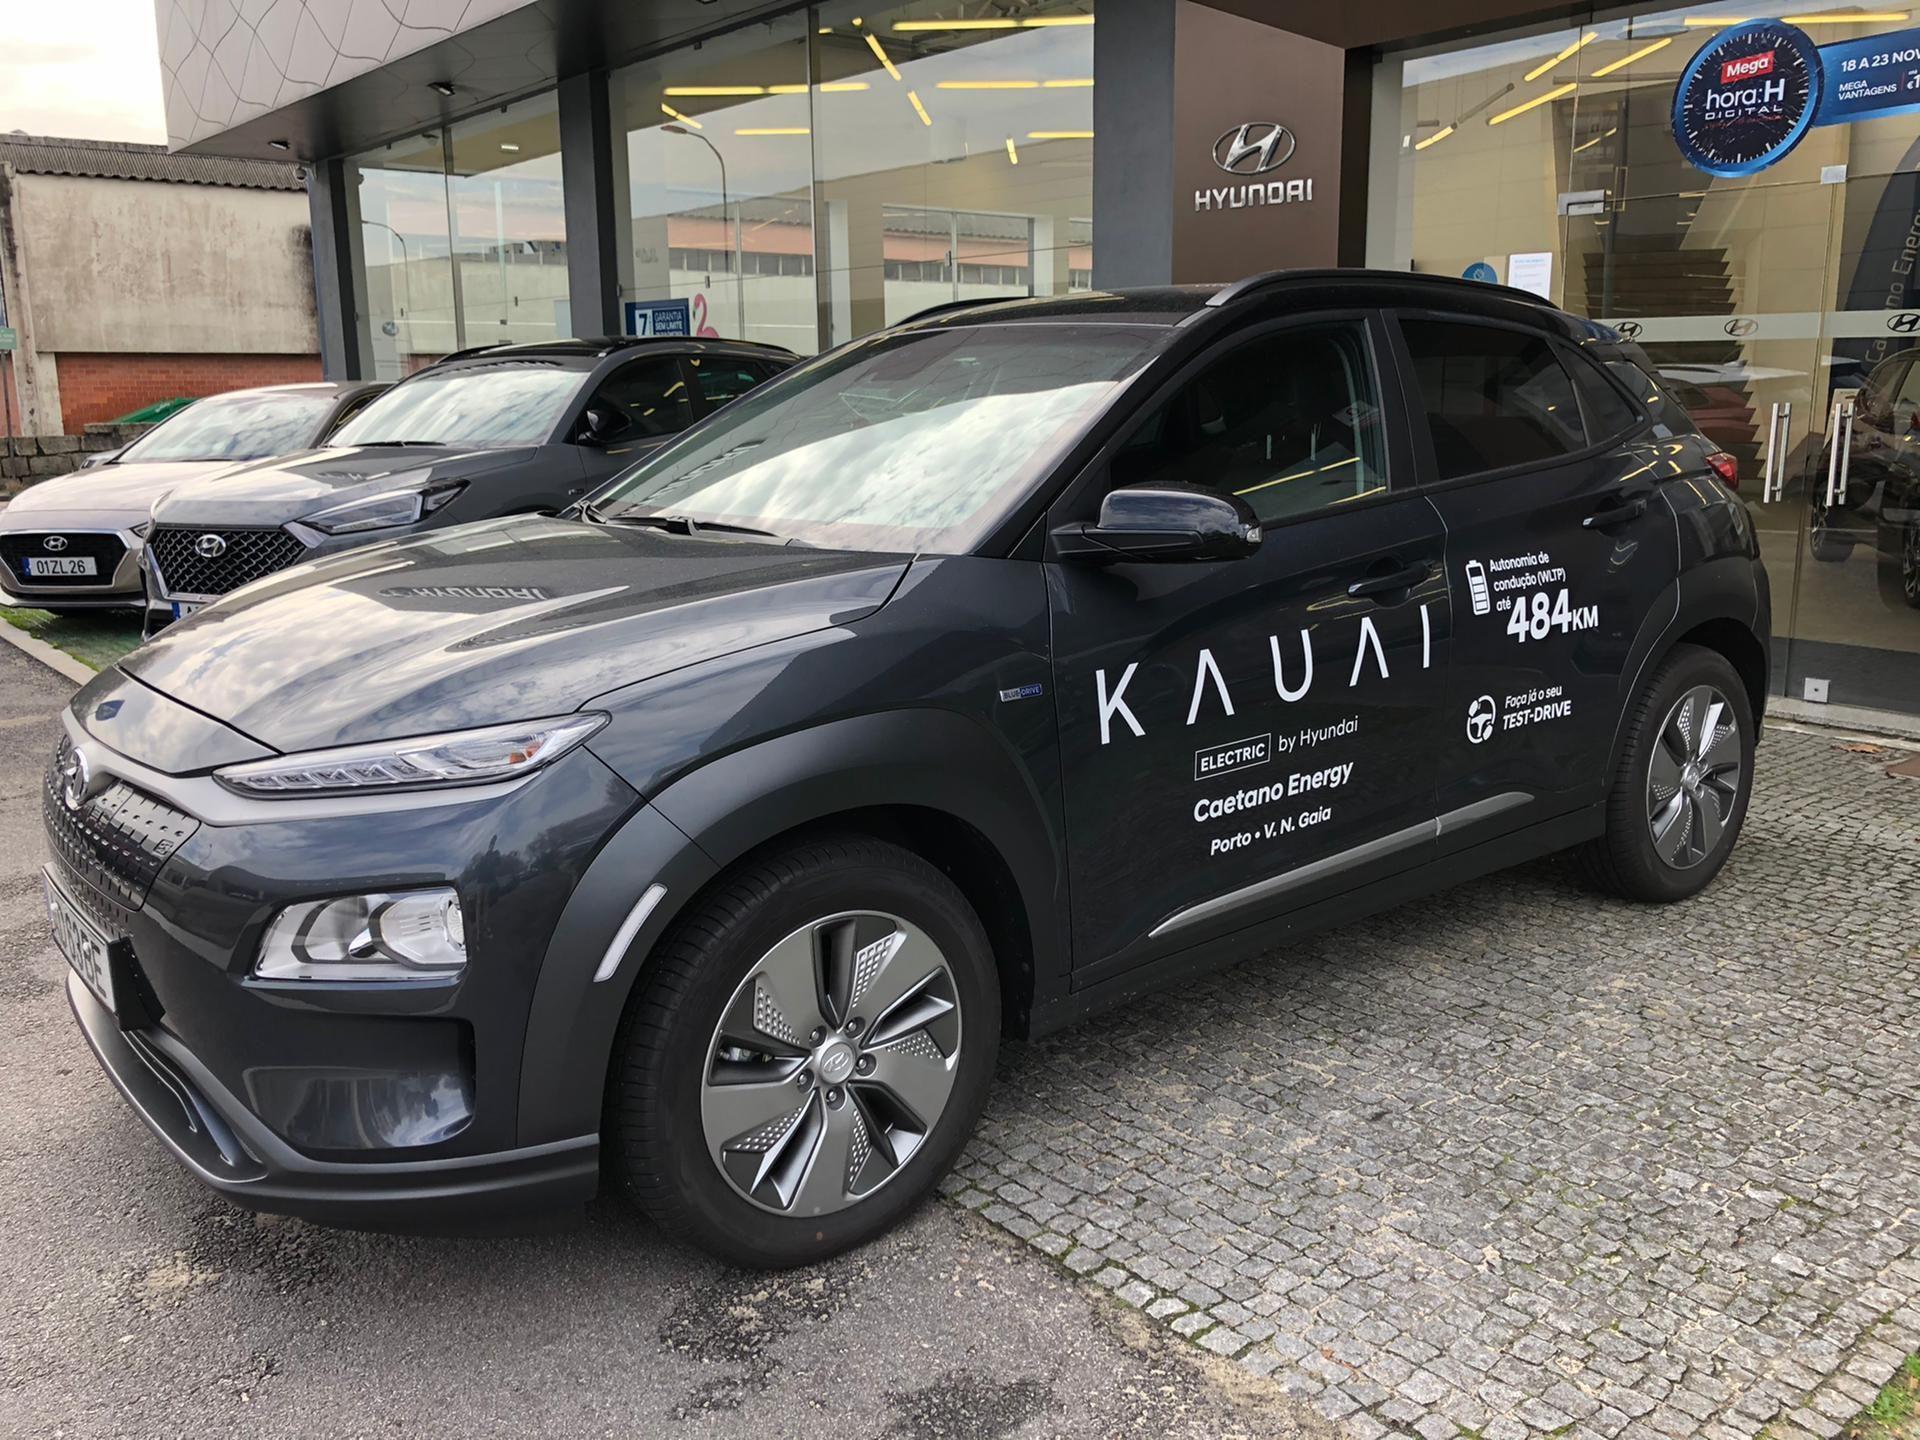 Hyundai Kauai Premium EV 64kw MY20 segunda mão Porto